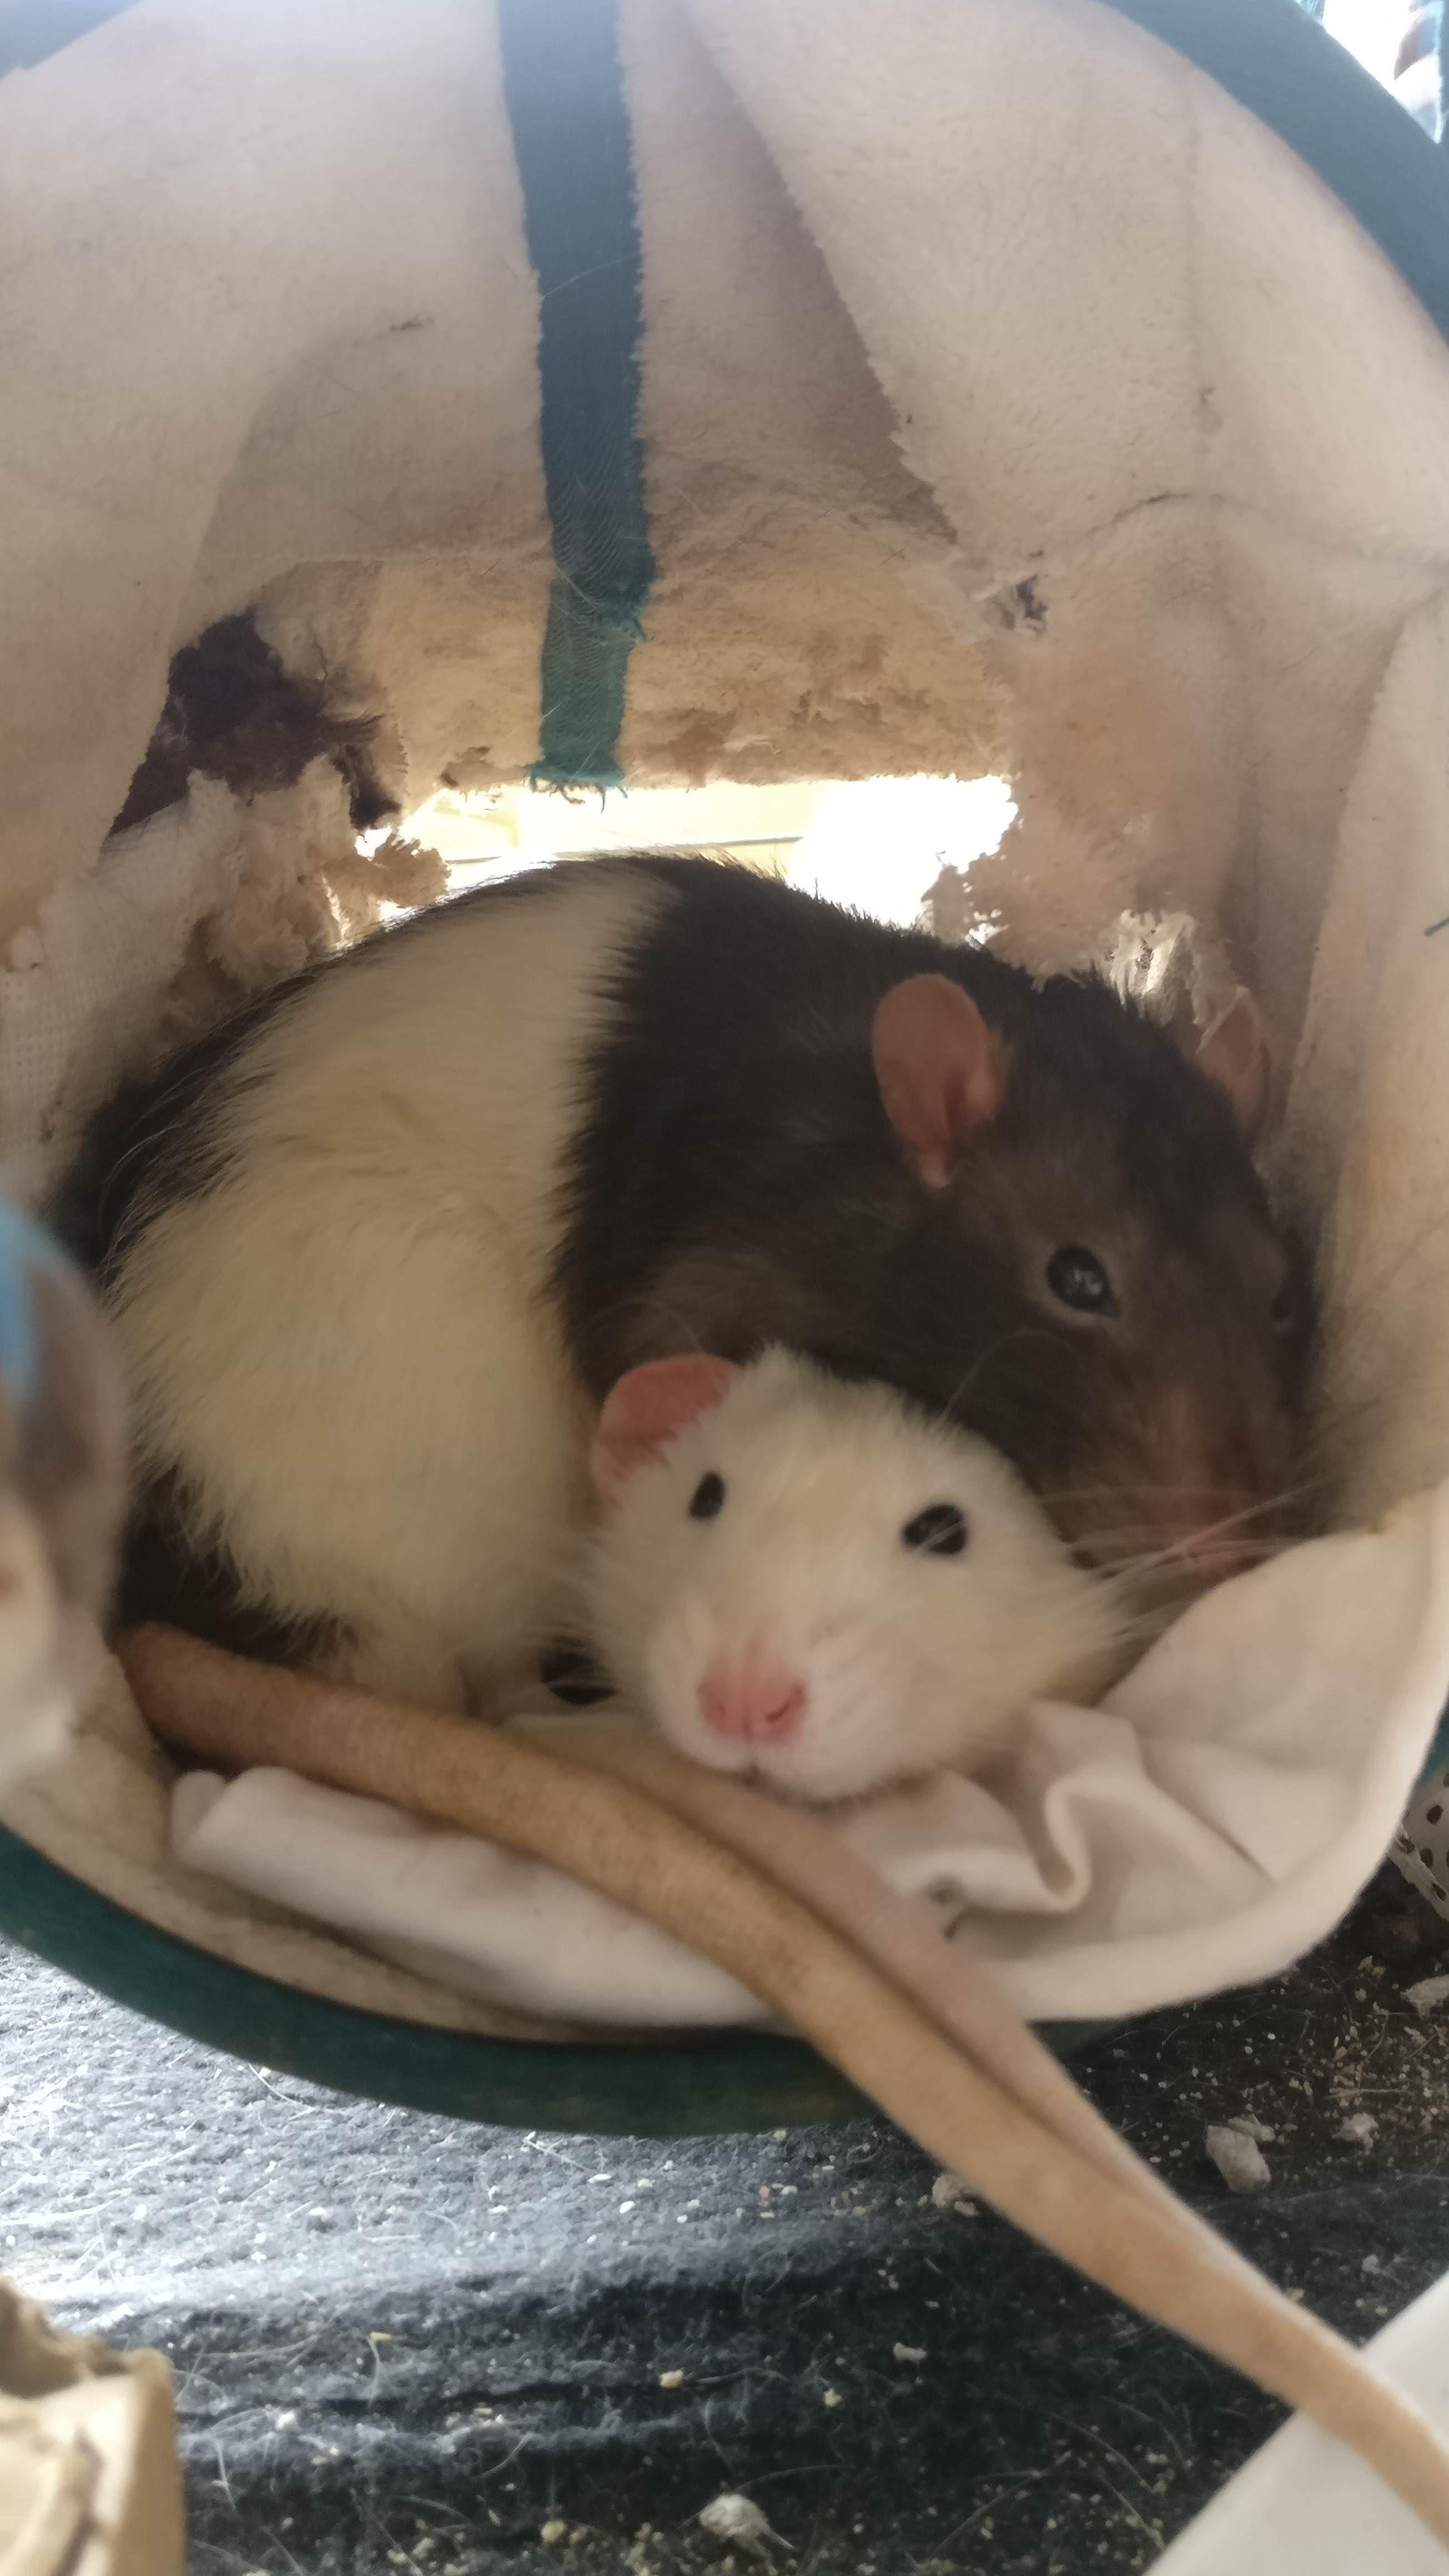 Two Little Cuddle Buds Aww Cute Rat Cuterats Ratsofpinterest Cuddle Fluffy Animals Pets Bestfriend Ittssofluff Super Cute Animals Pet Rats Cute Rats